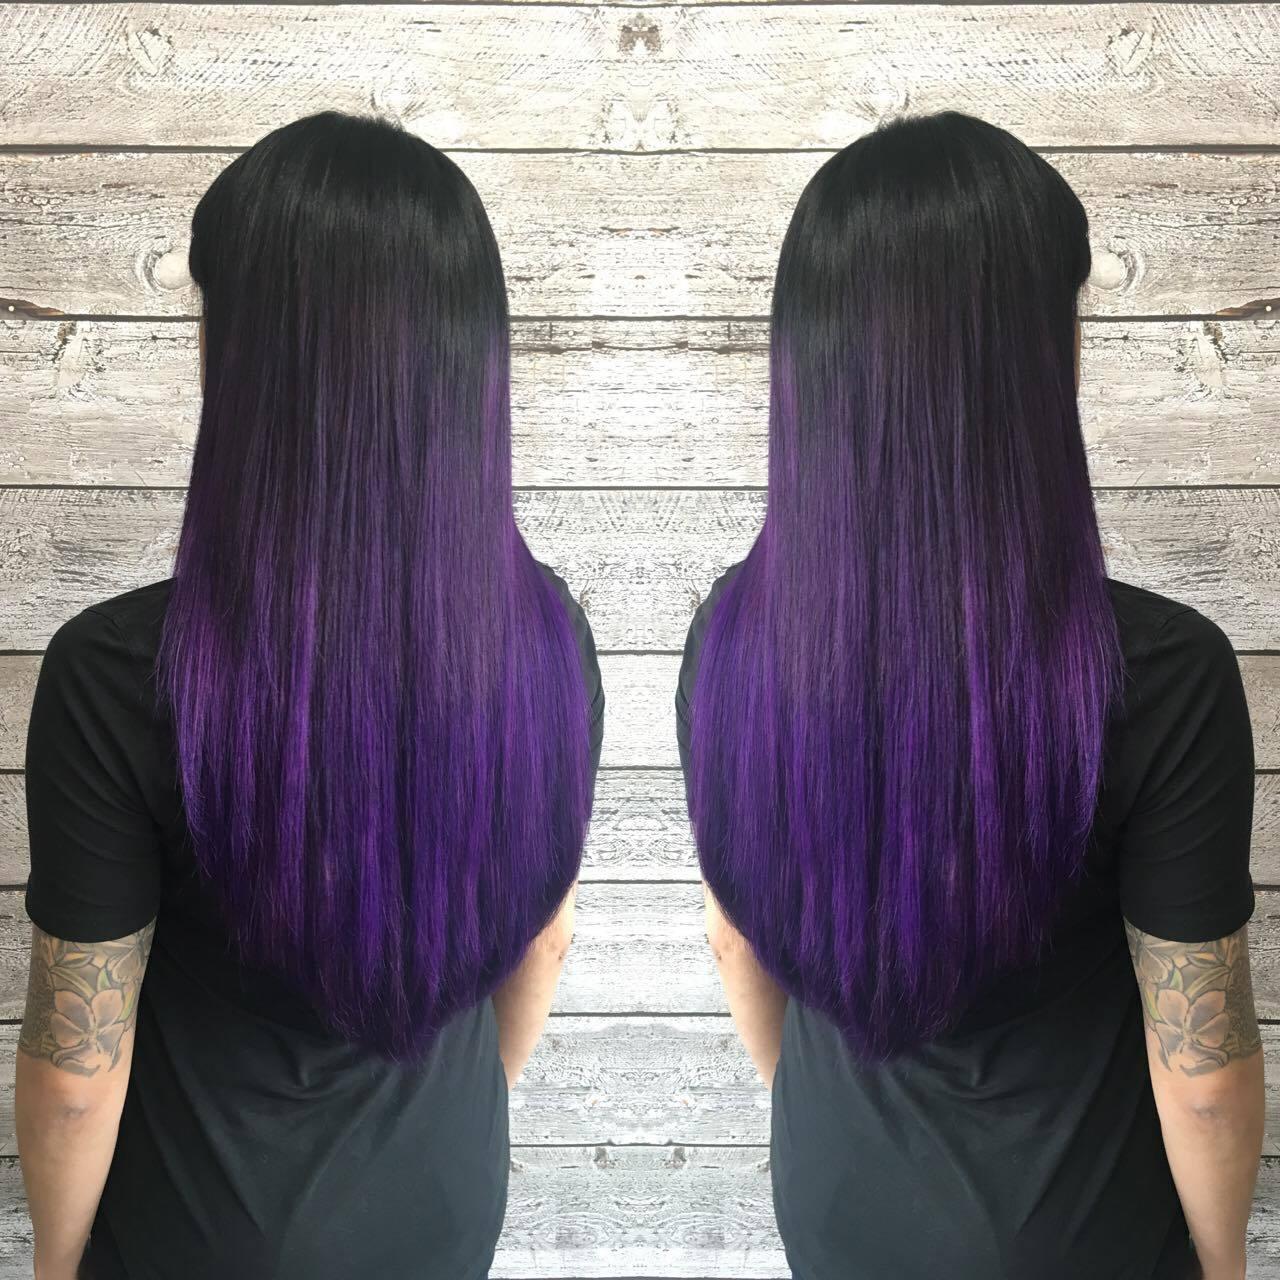 Joico K Pak Color Intensity Reviews In Hair Colour